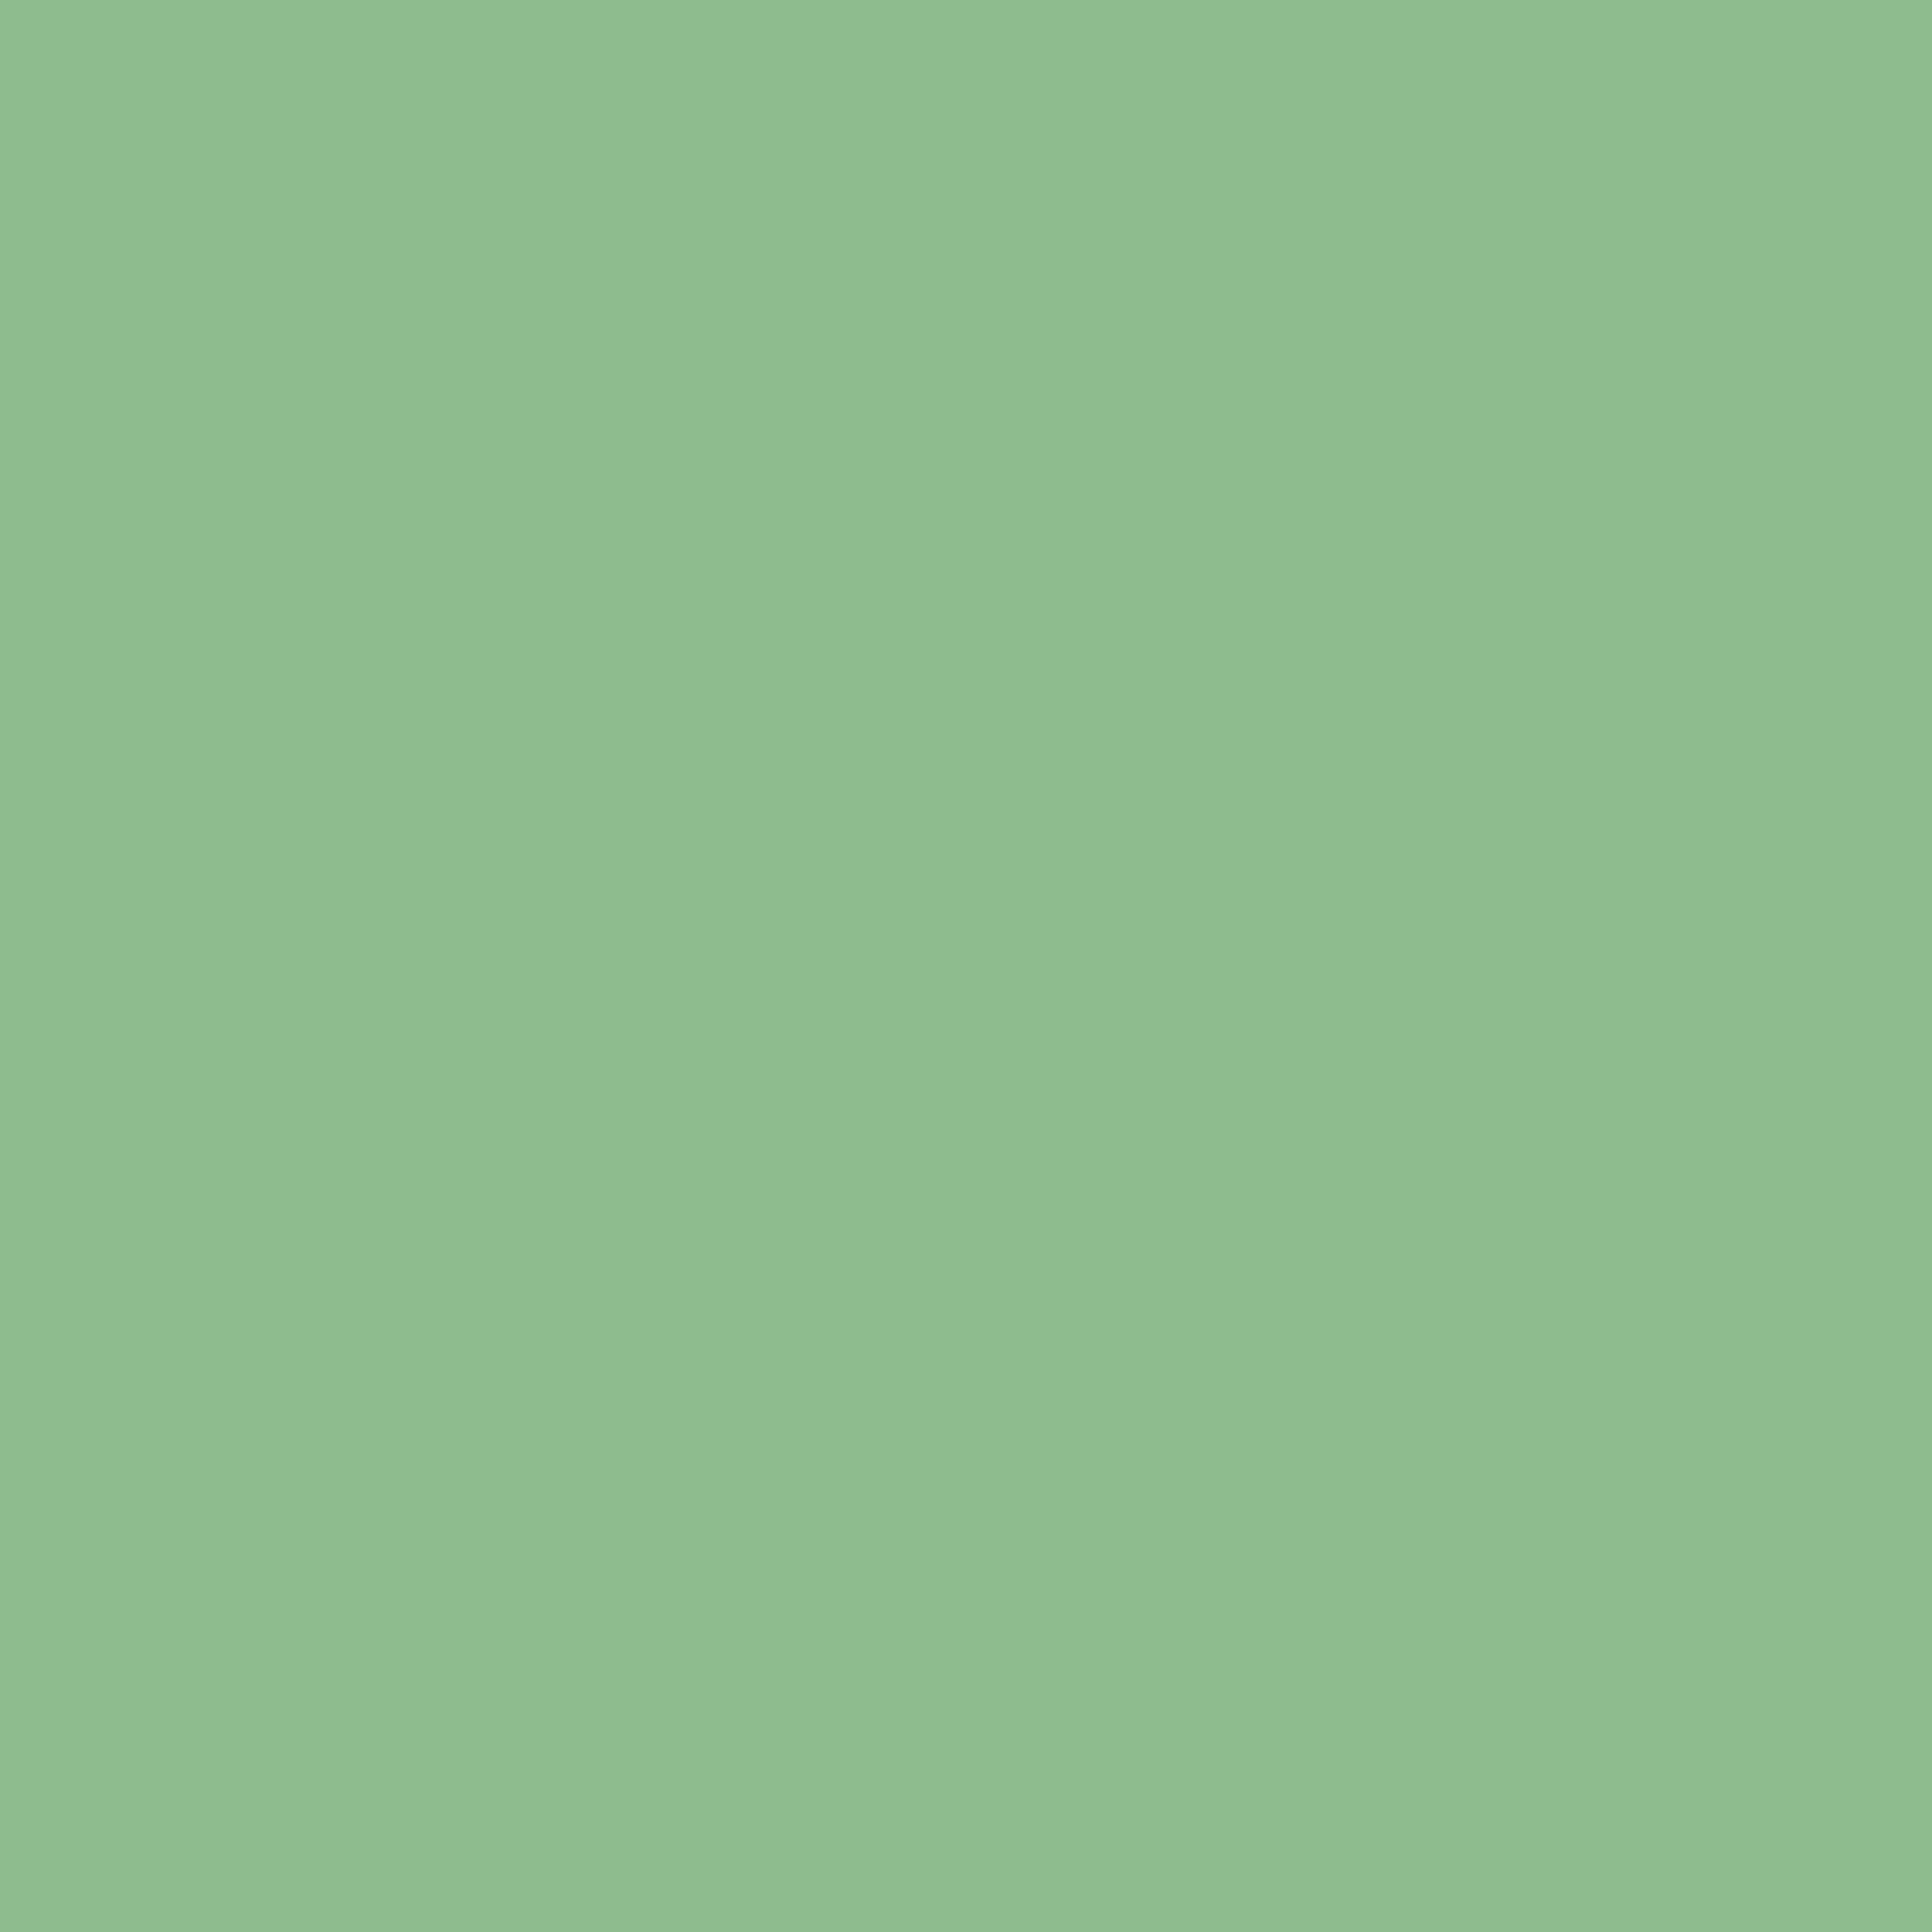 2732x2732 Dark Sea Green Solid Color Background